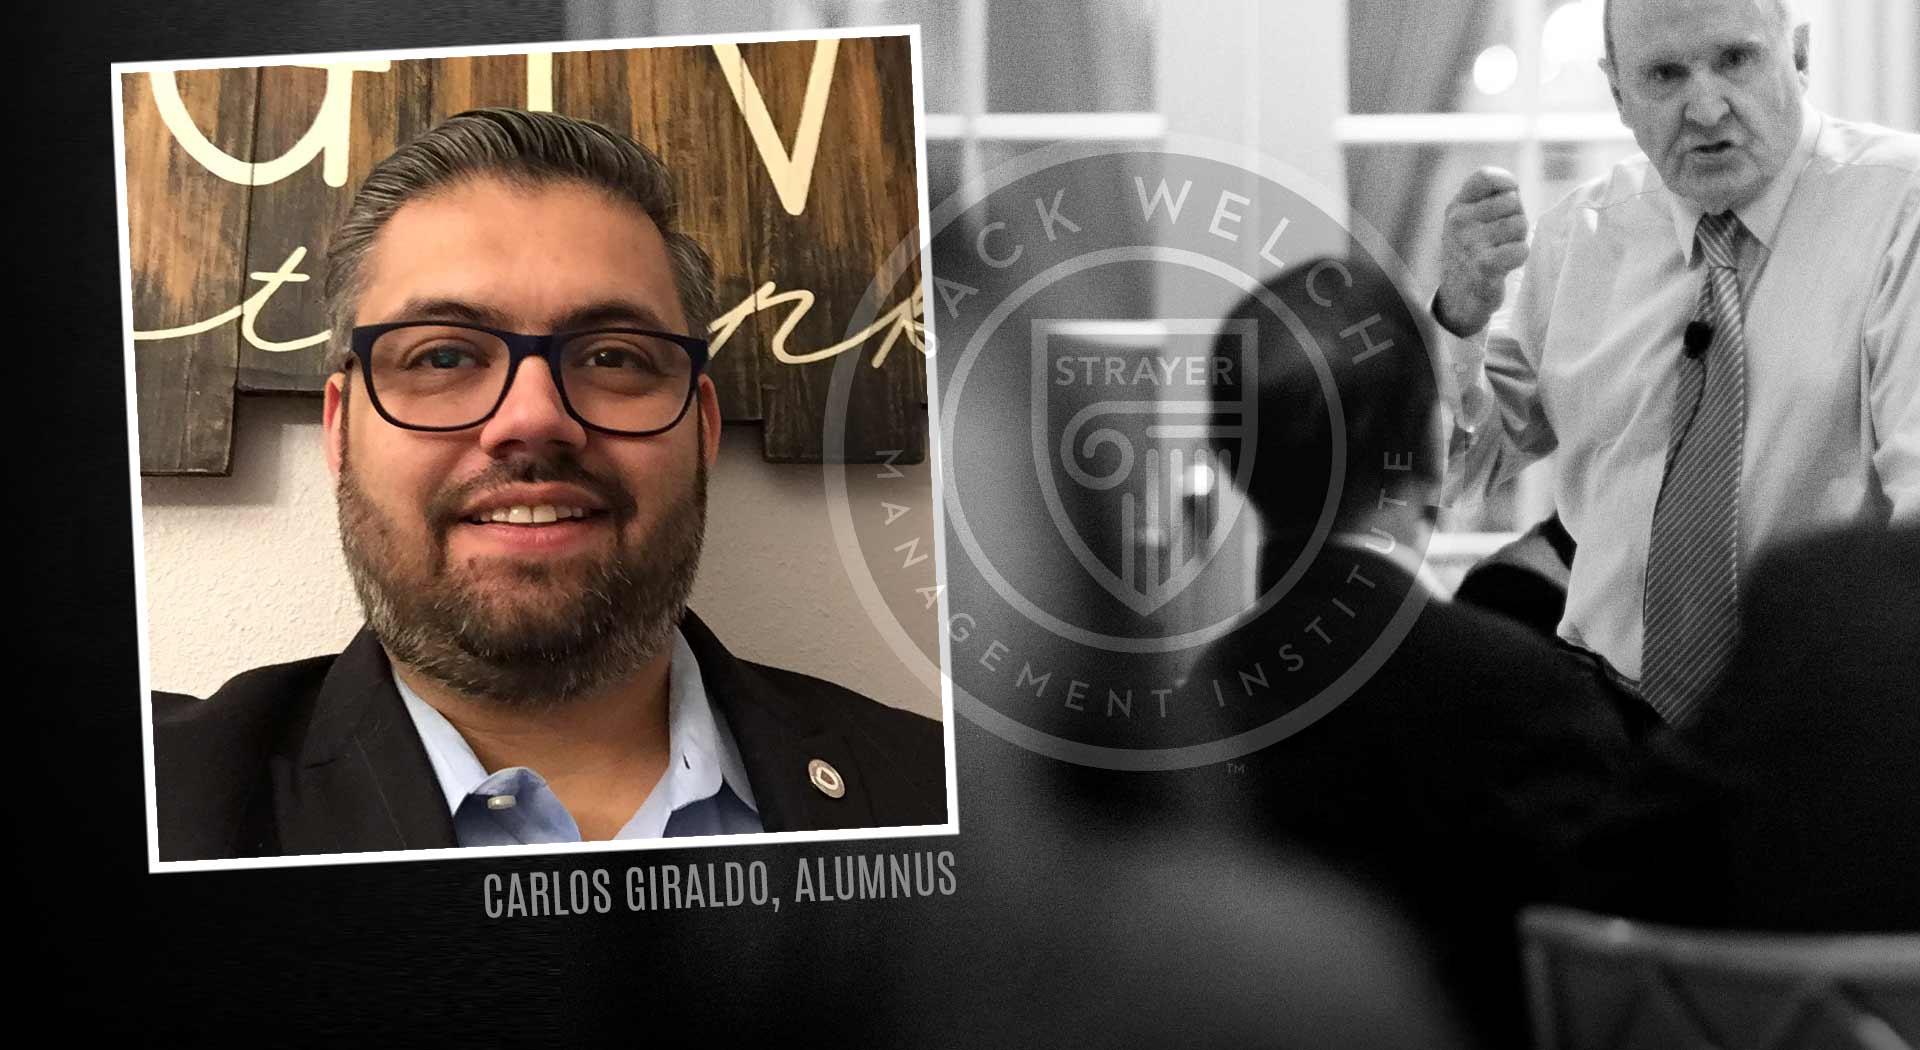 Jack Welch MBA, Carlos Giraldo